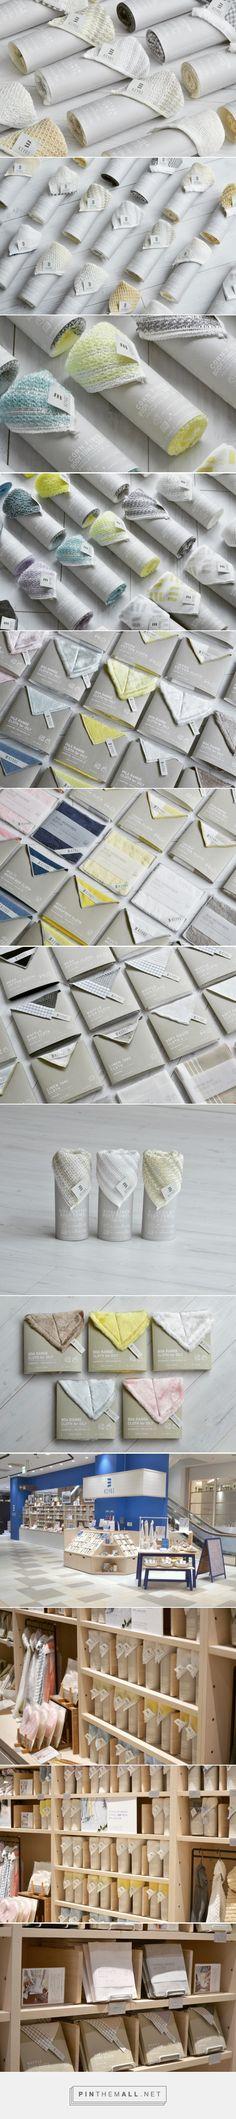 Kiyoi towel packaging design by Yusuke Taguchi Design - http://www.packagingoftheworld.com/2017/01/kiyoi-product.html